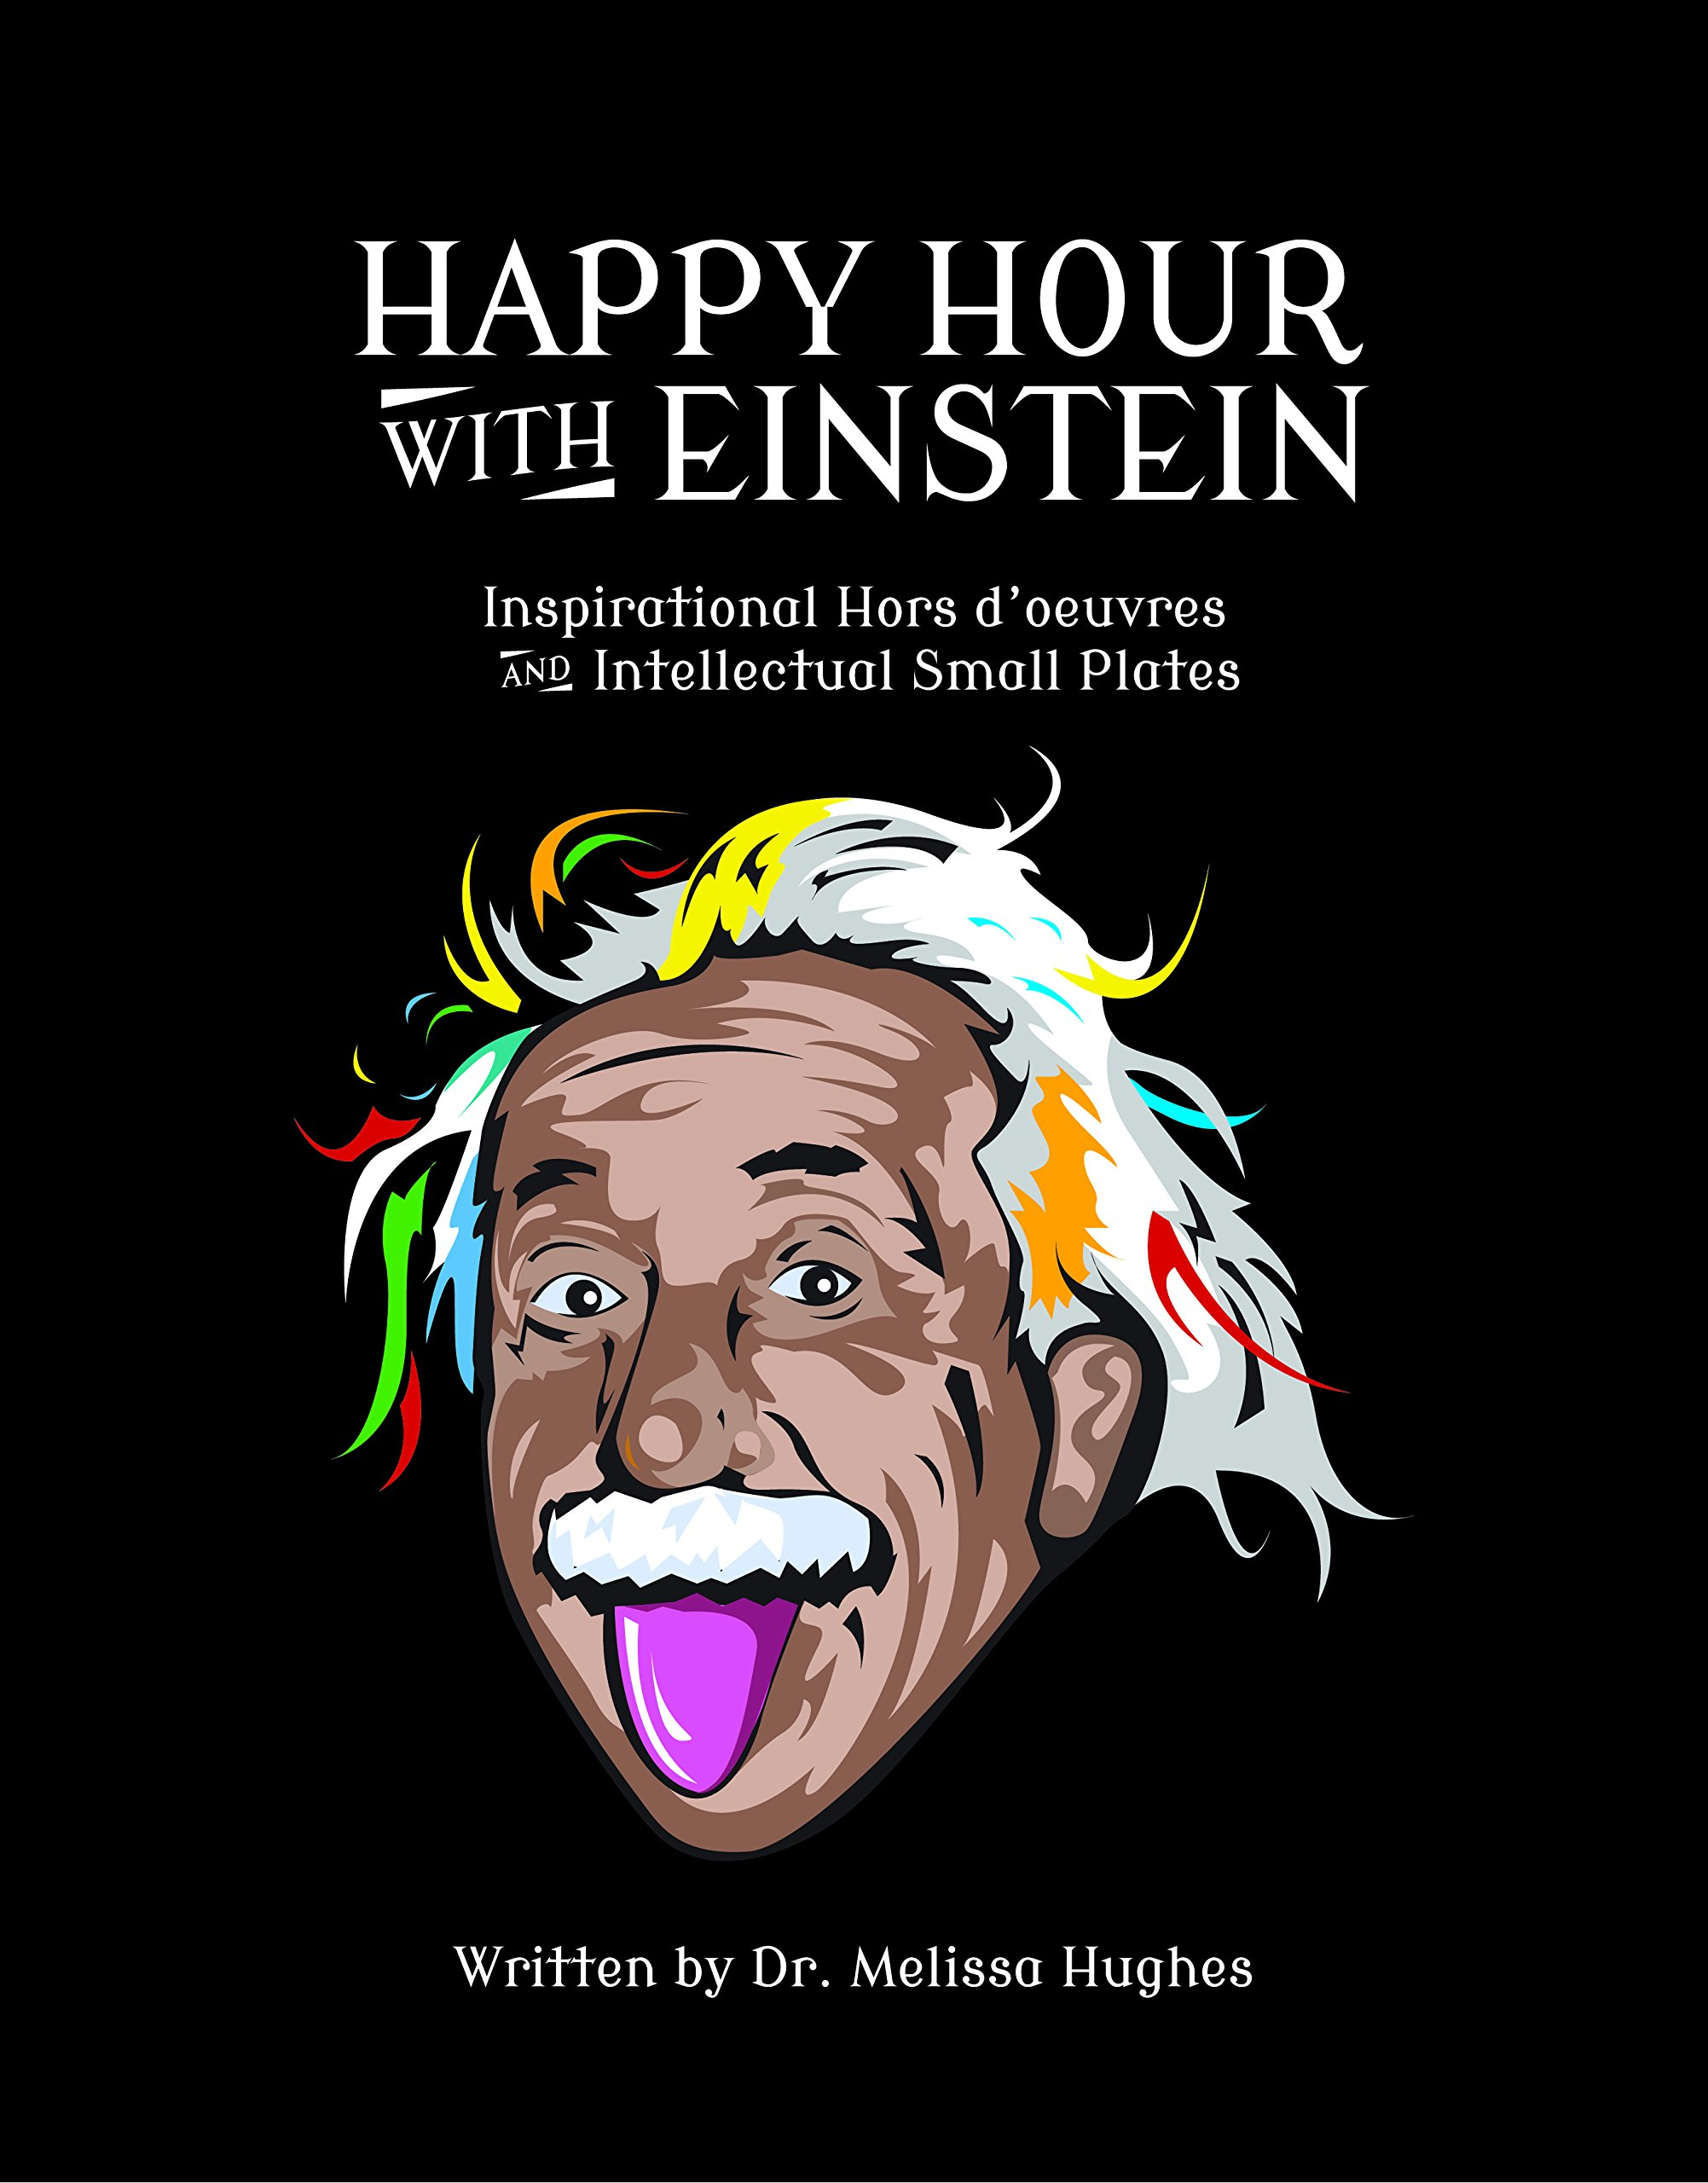 Happy Hour with Einstein: Dr. Melissa Hughes: 9780692785584: Amazon.com:  Books